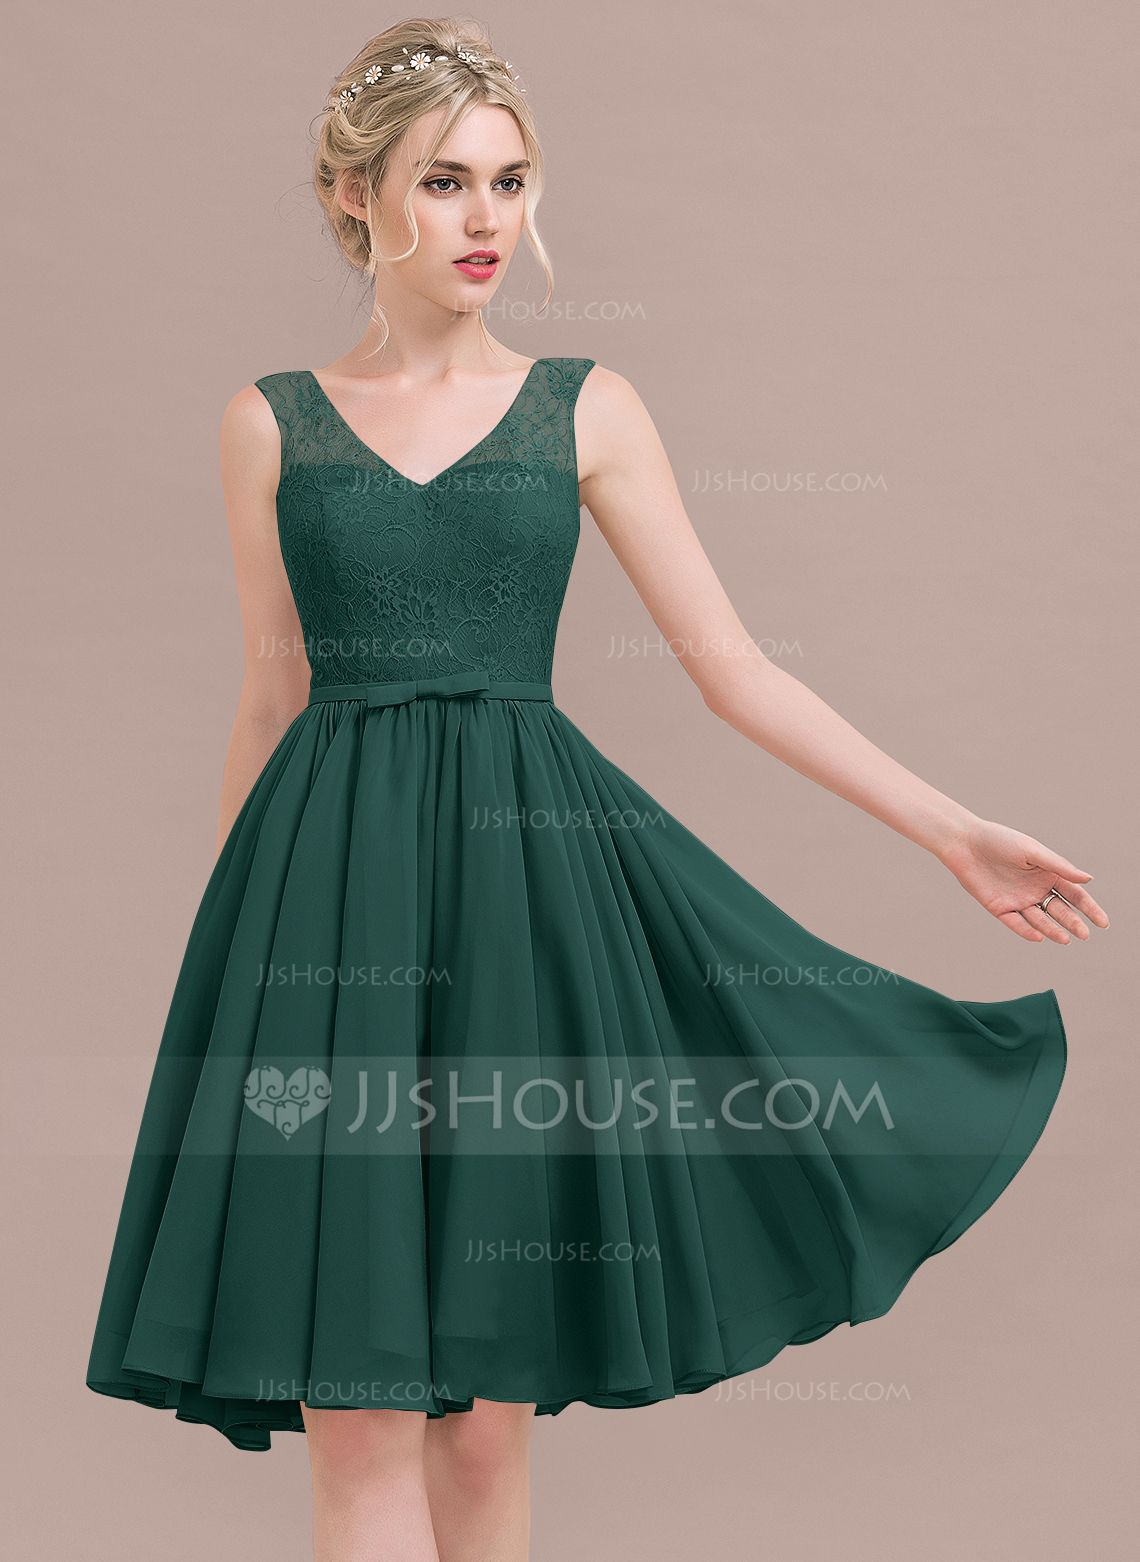 Us 97 00 A Line Princess V Neck Knee Length Chiffon Lace Bridesmaid Dress With Bow S Jj S House Bridesmaid Dresses Chiffon Lace Tea Length Bridesmaid Dresses [ 1562 x 1140 Pixel ]